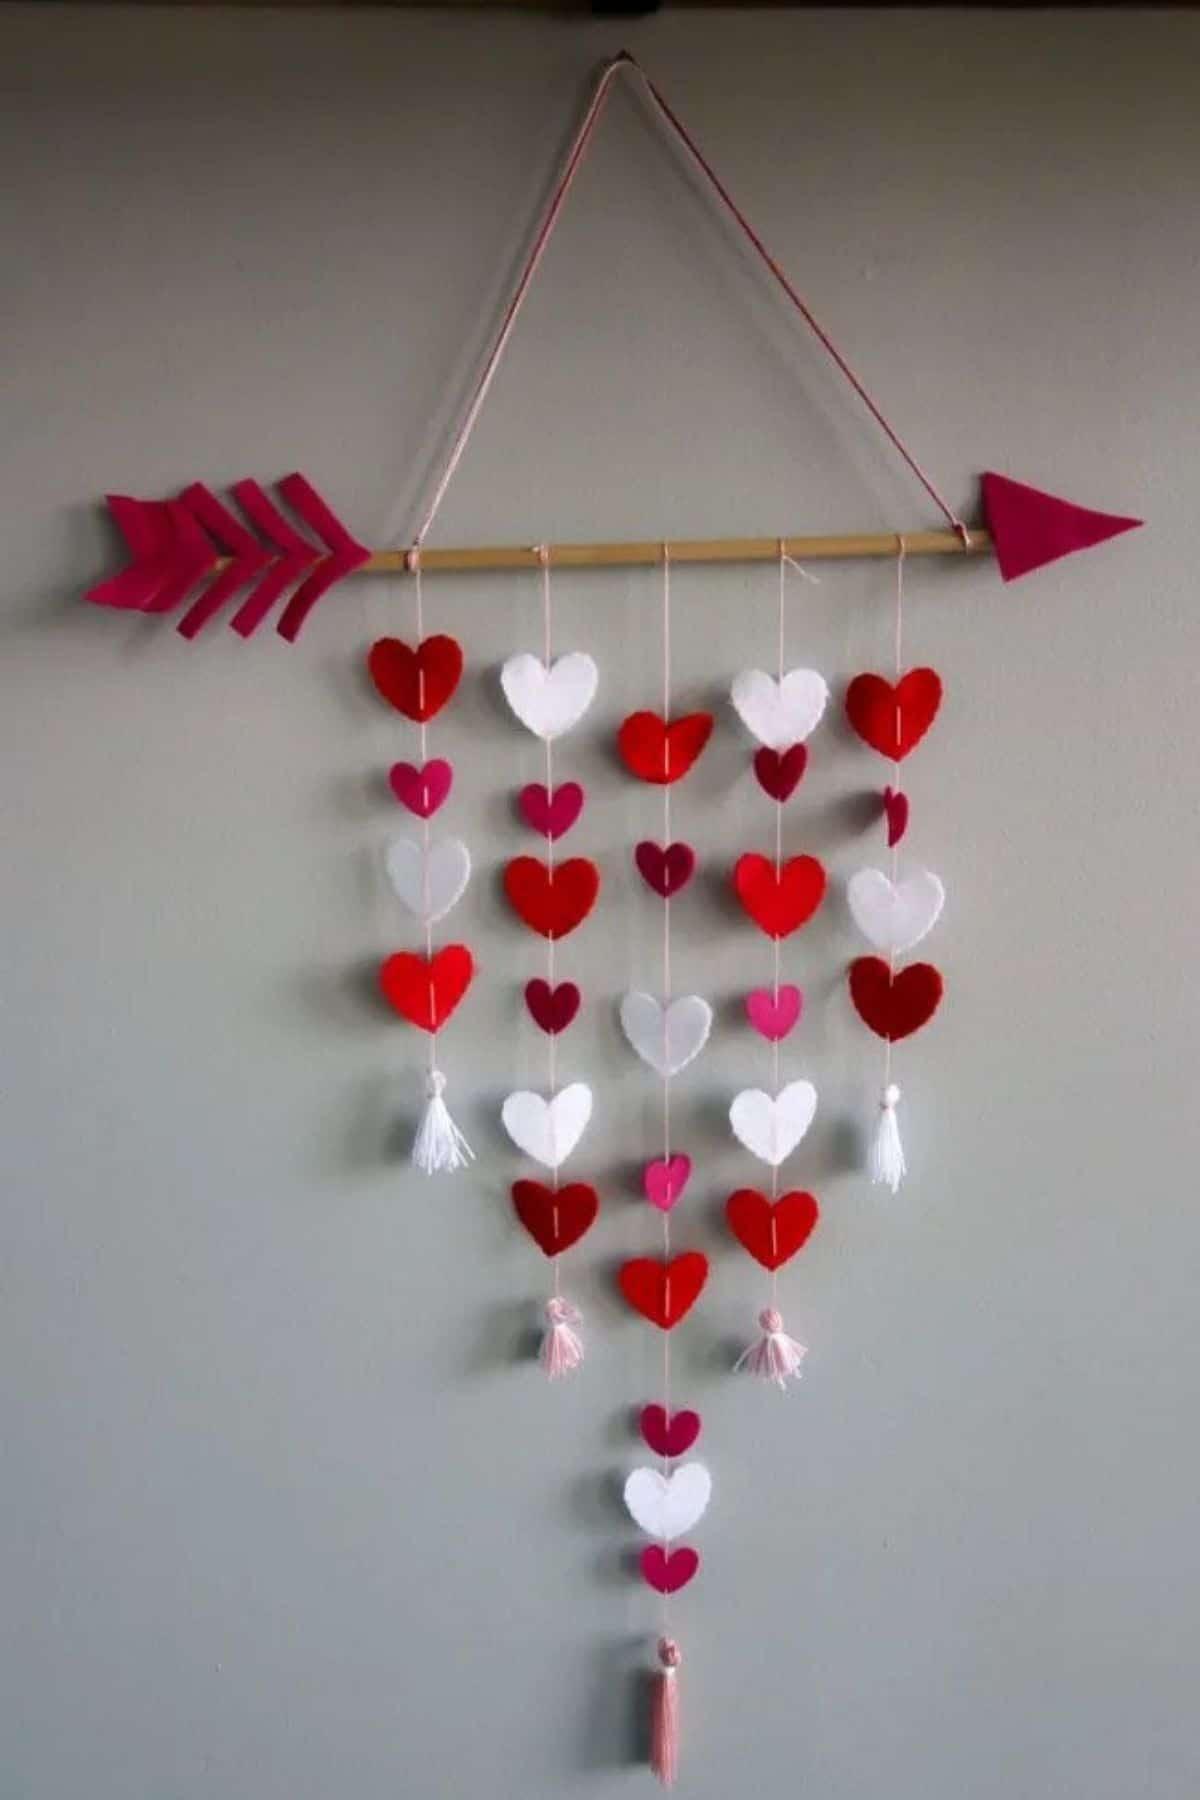 Hanging heart decor